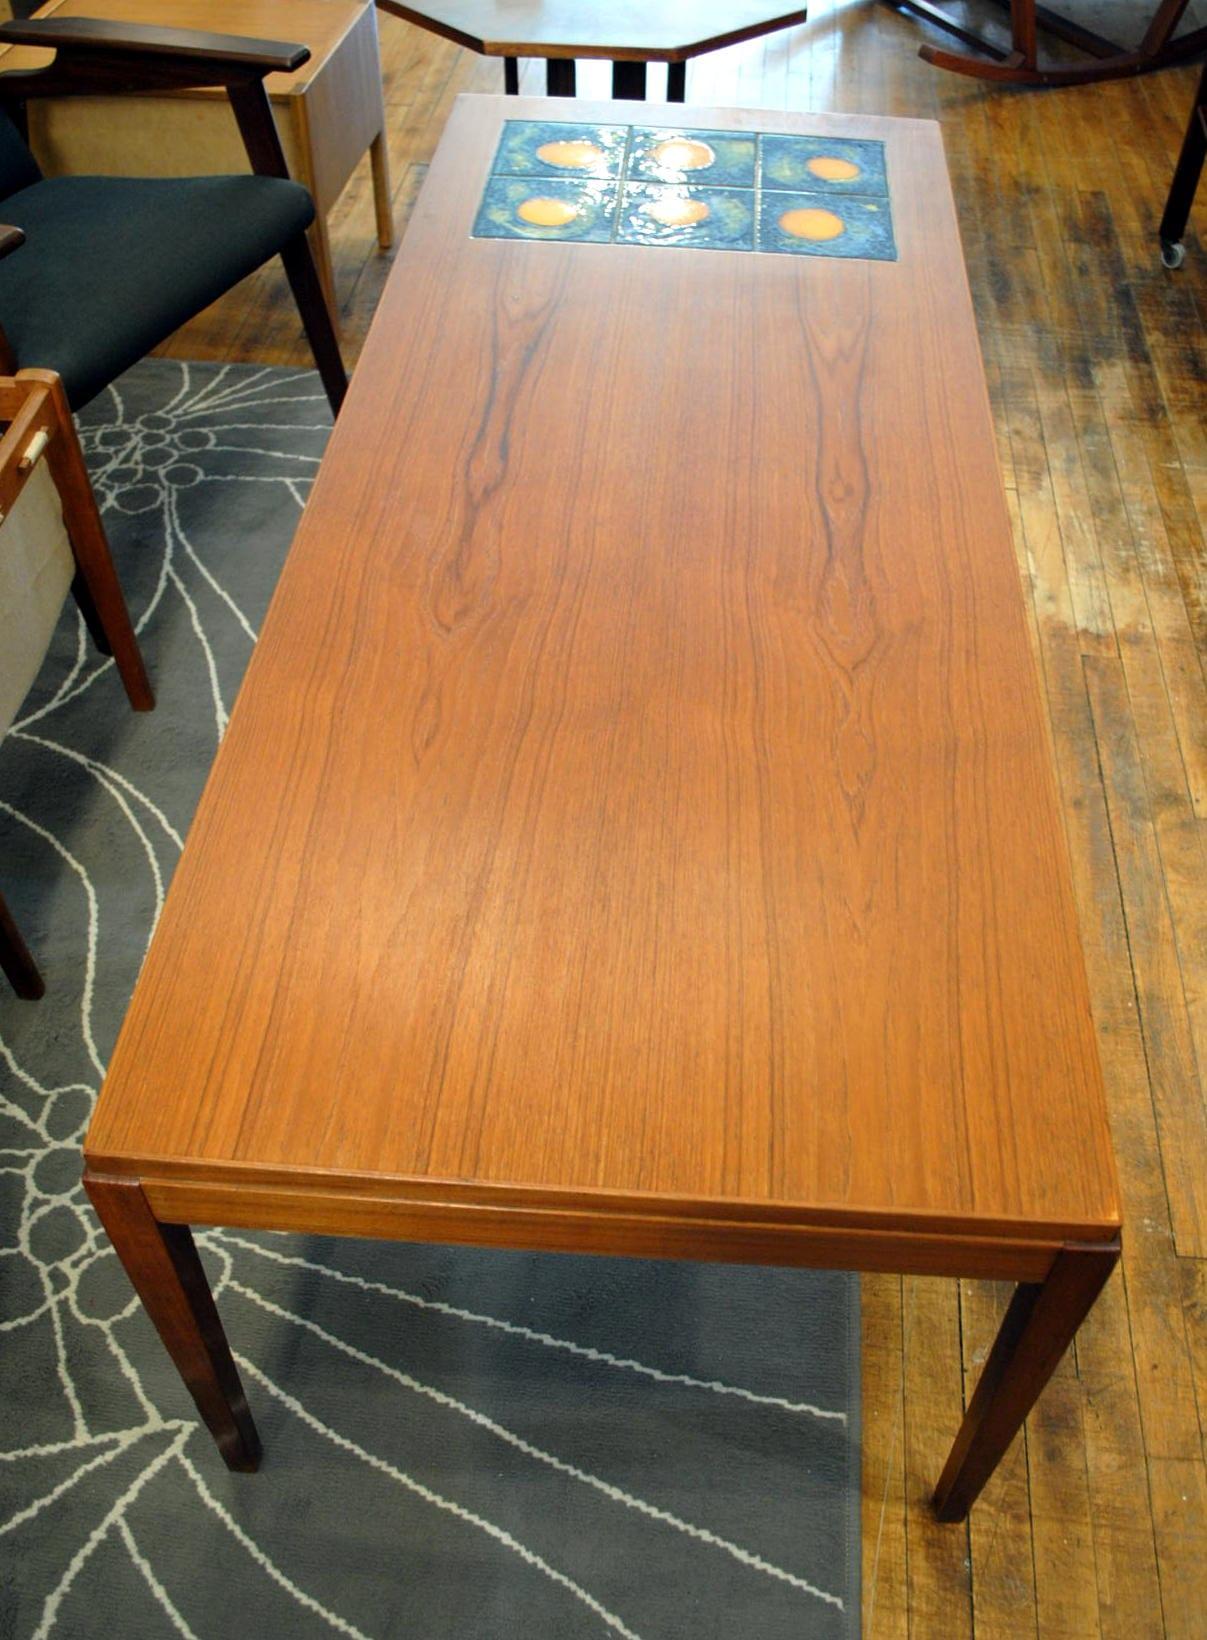 Danish Teak Coffee Table w/hand painted tile | Circa